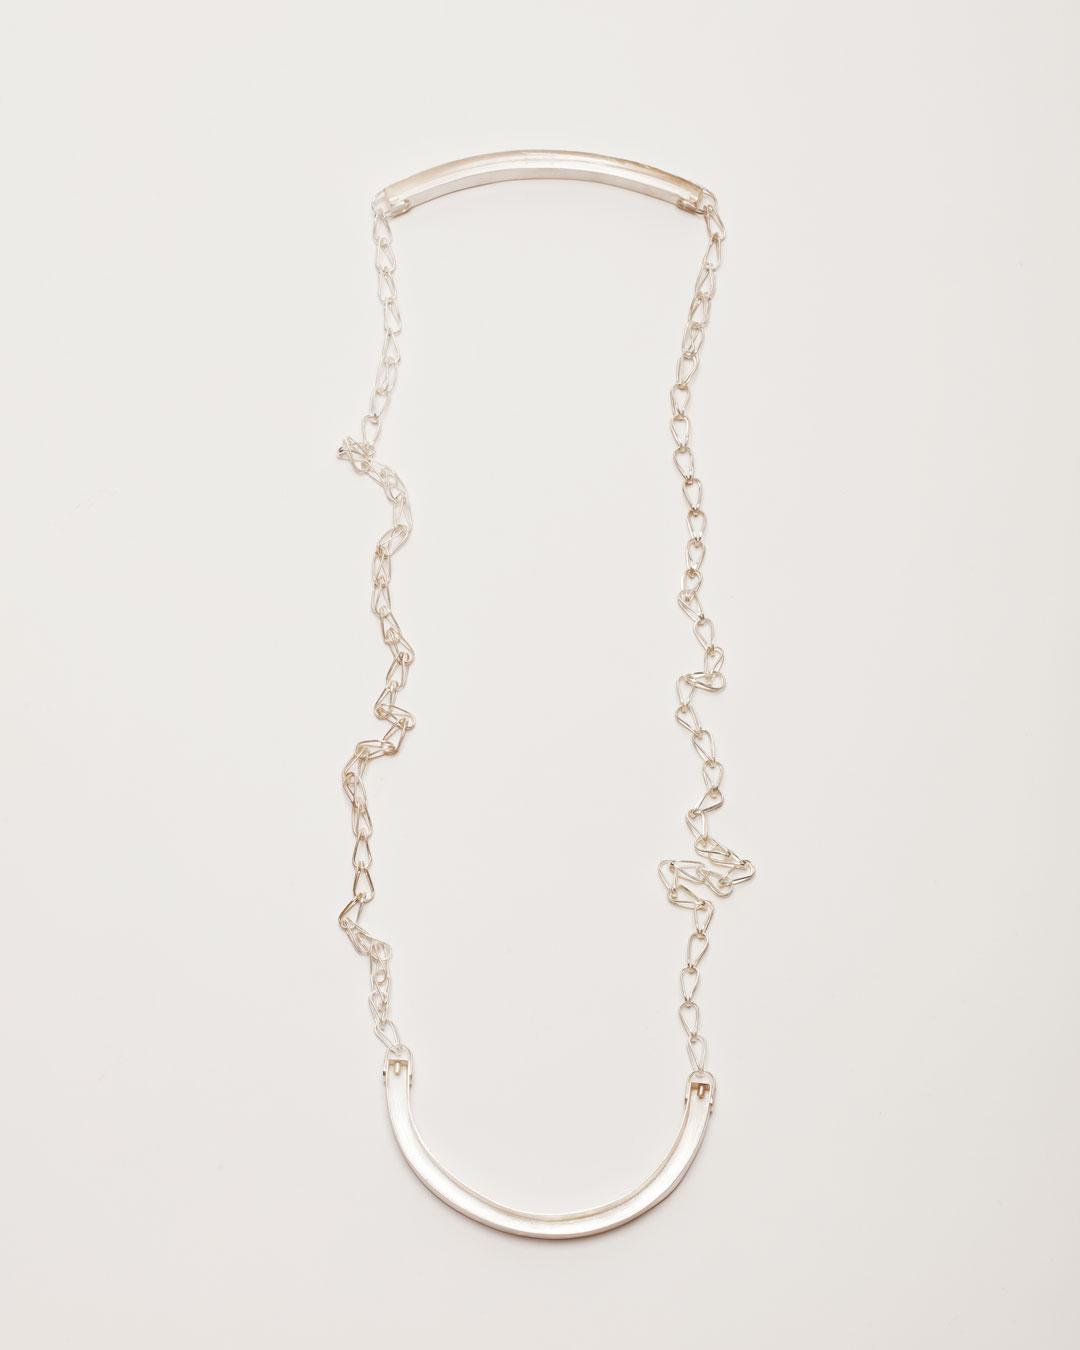 Christine Matthias, untitled, 2016, necklace; silver, L 1250 mm, €2550